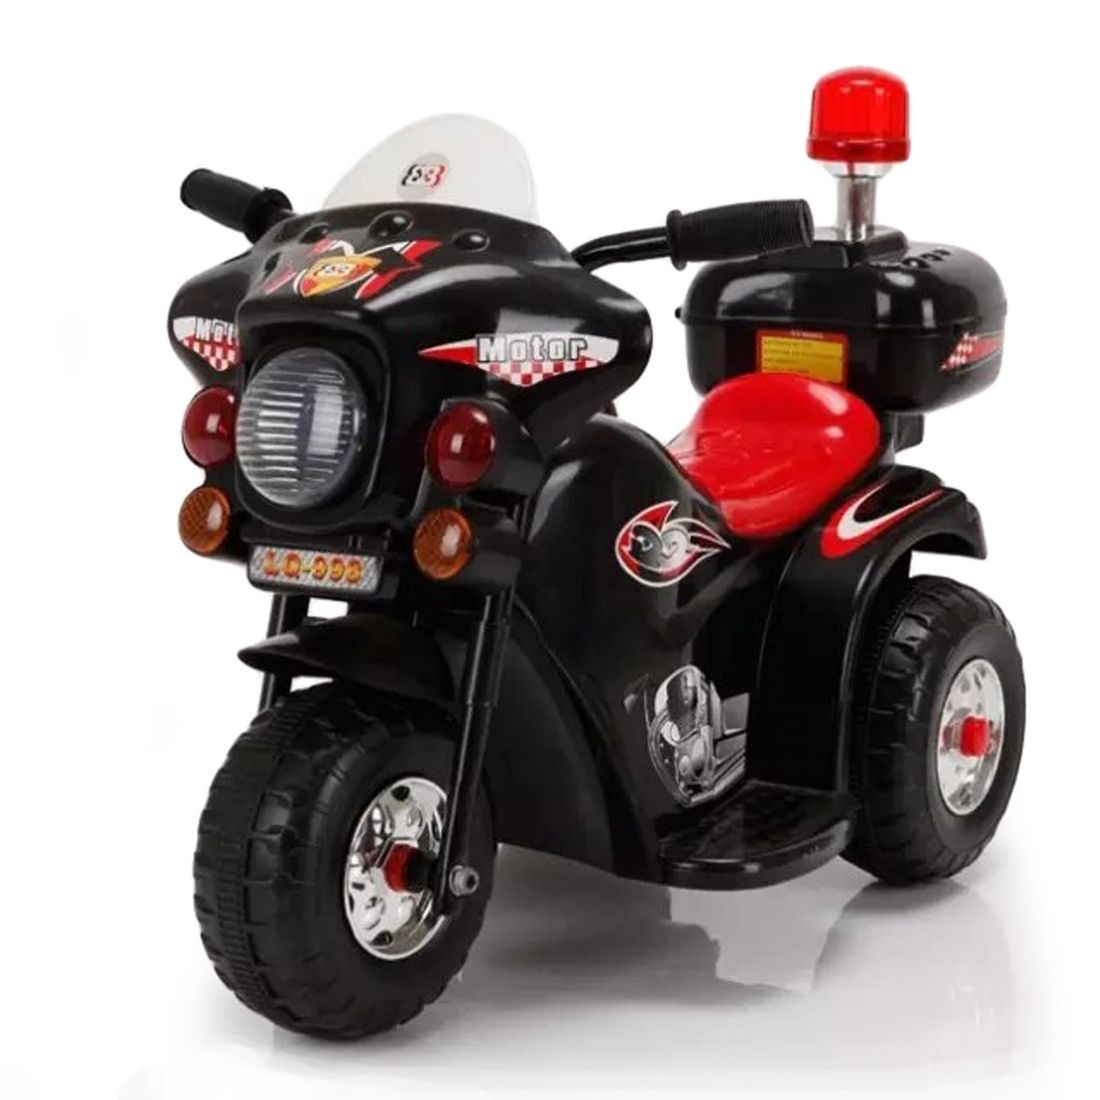 Mini Moto Elétrica Infantil Motorizado 6V Triciclo Polícia